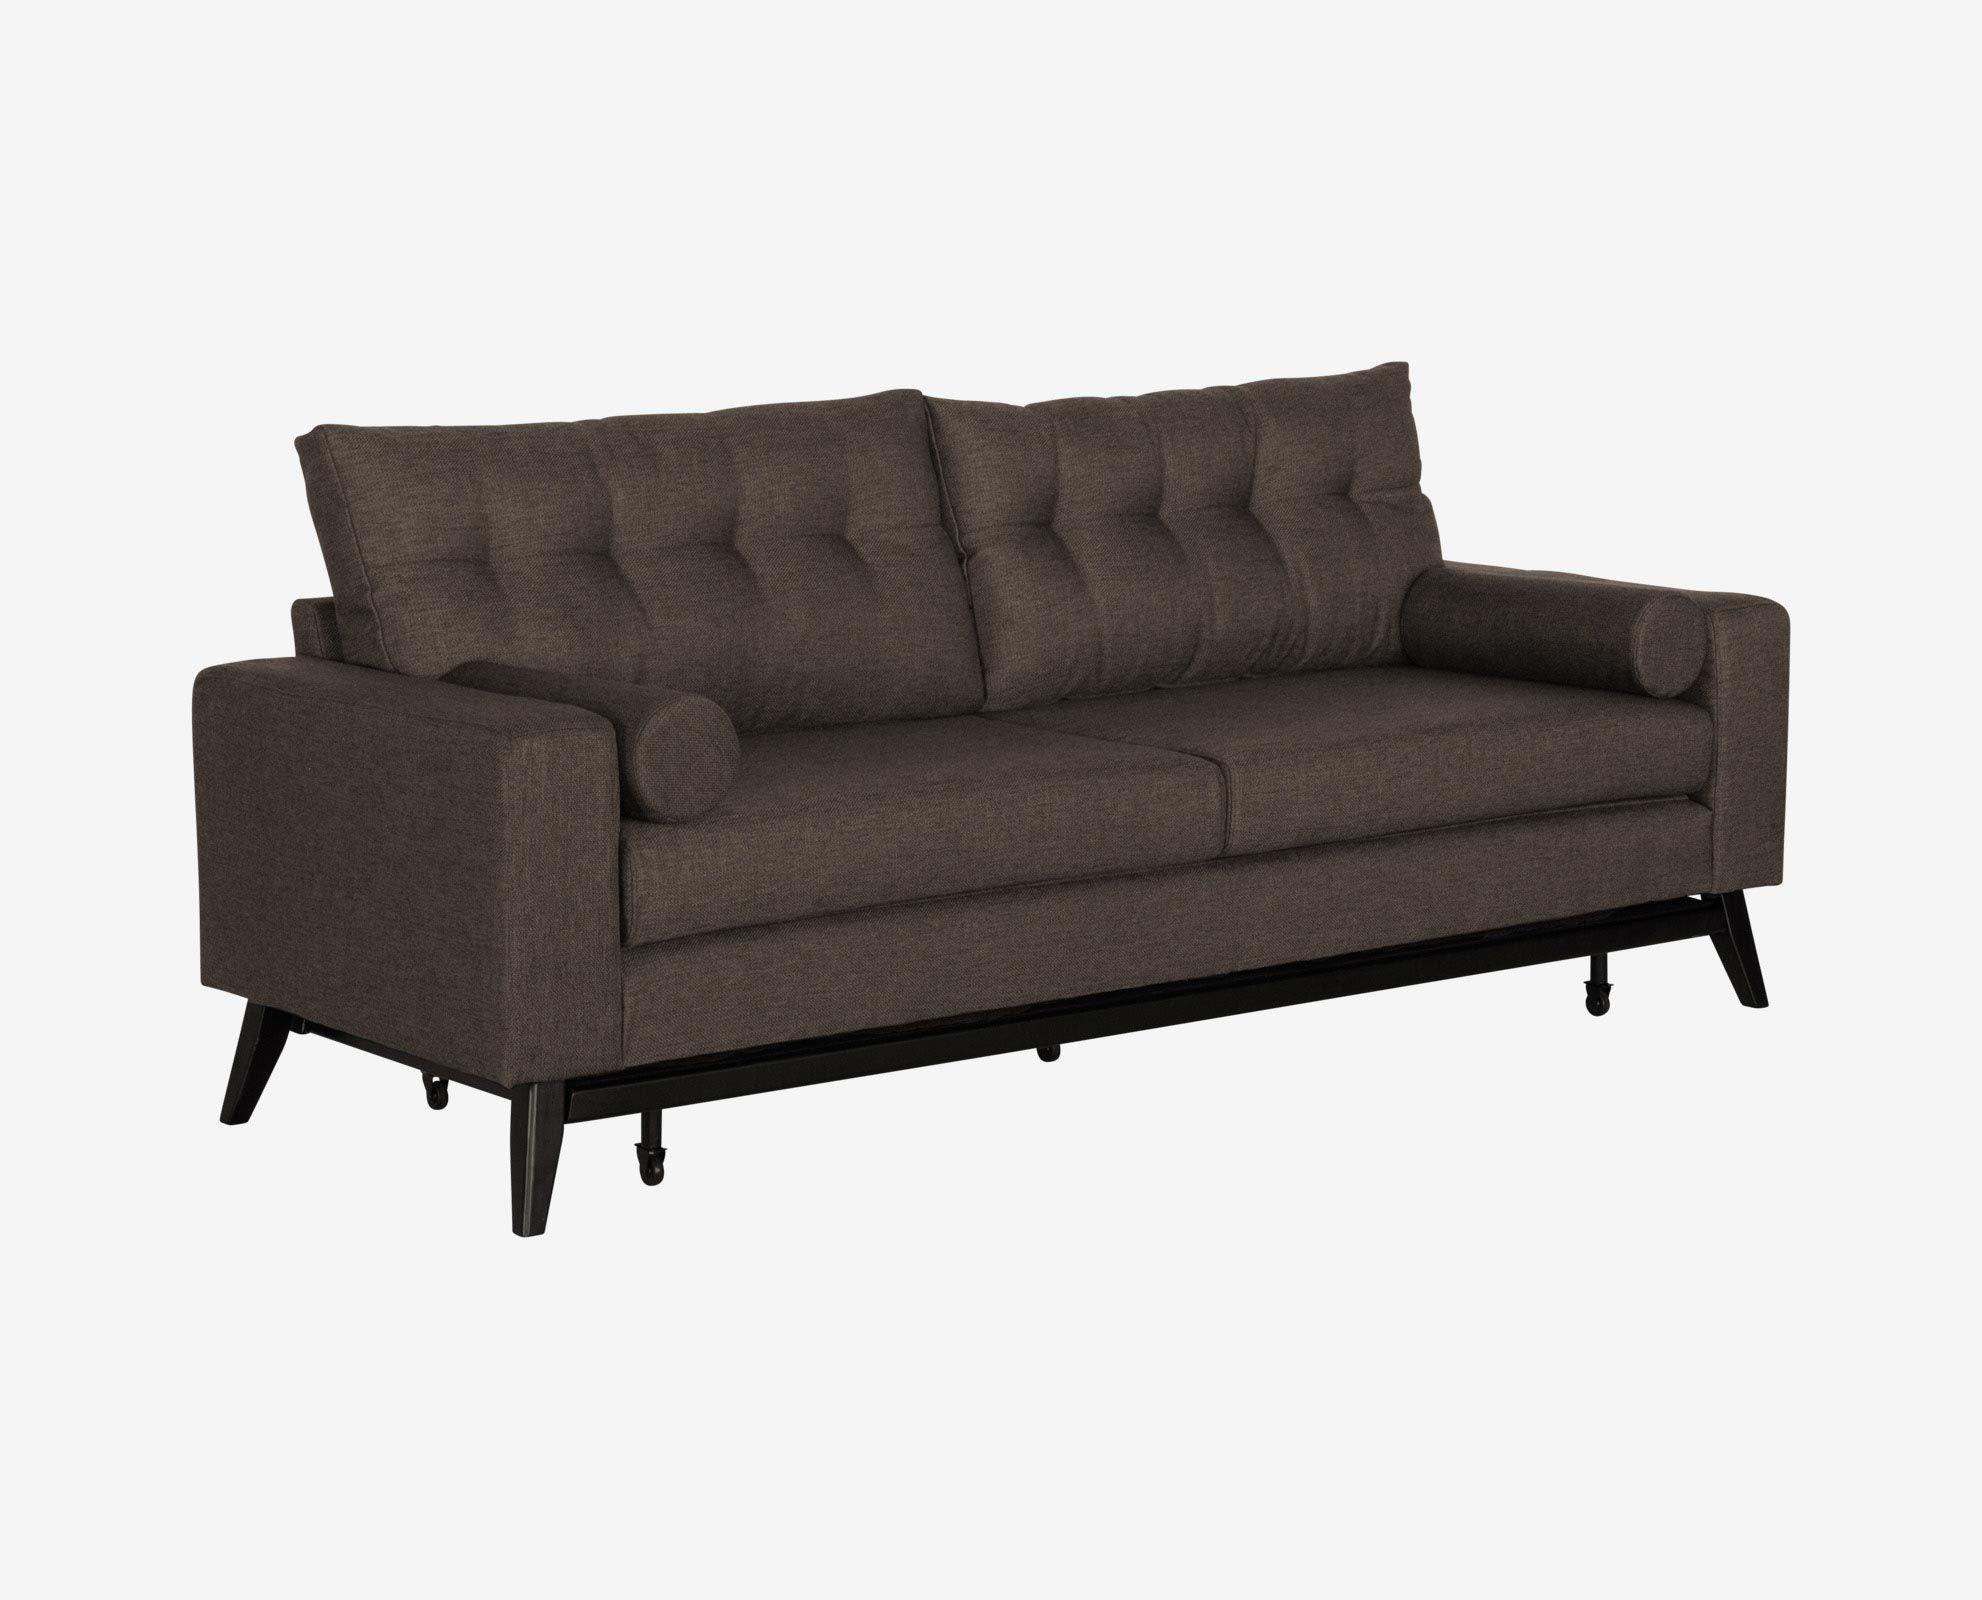 Dania Sleeper Couch   Bruin Blog